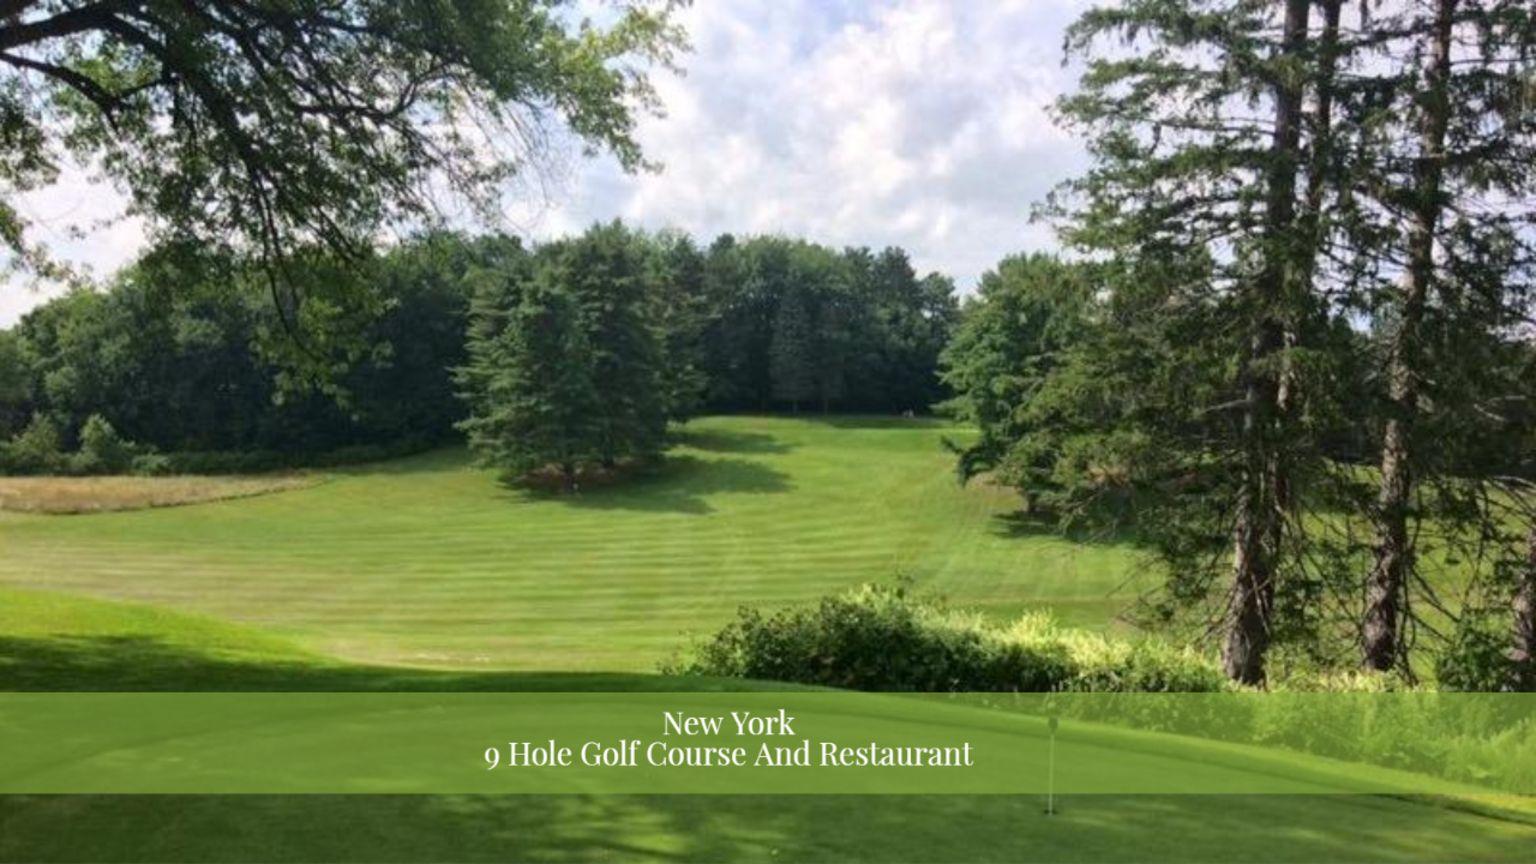 9 Hole Golf Course & Restaurant